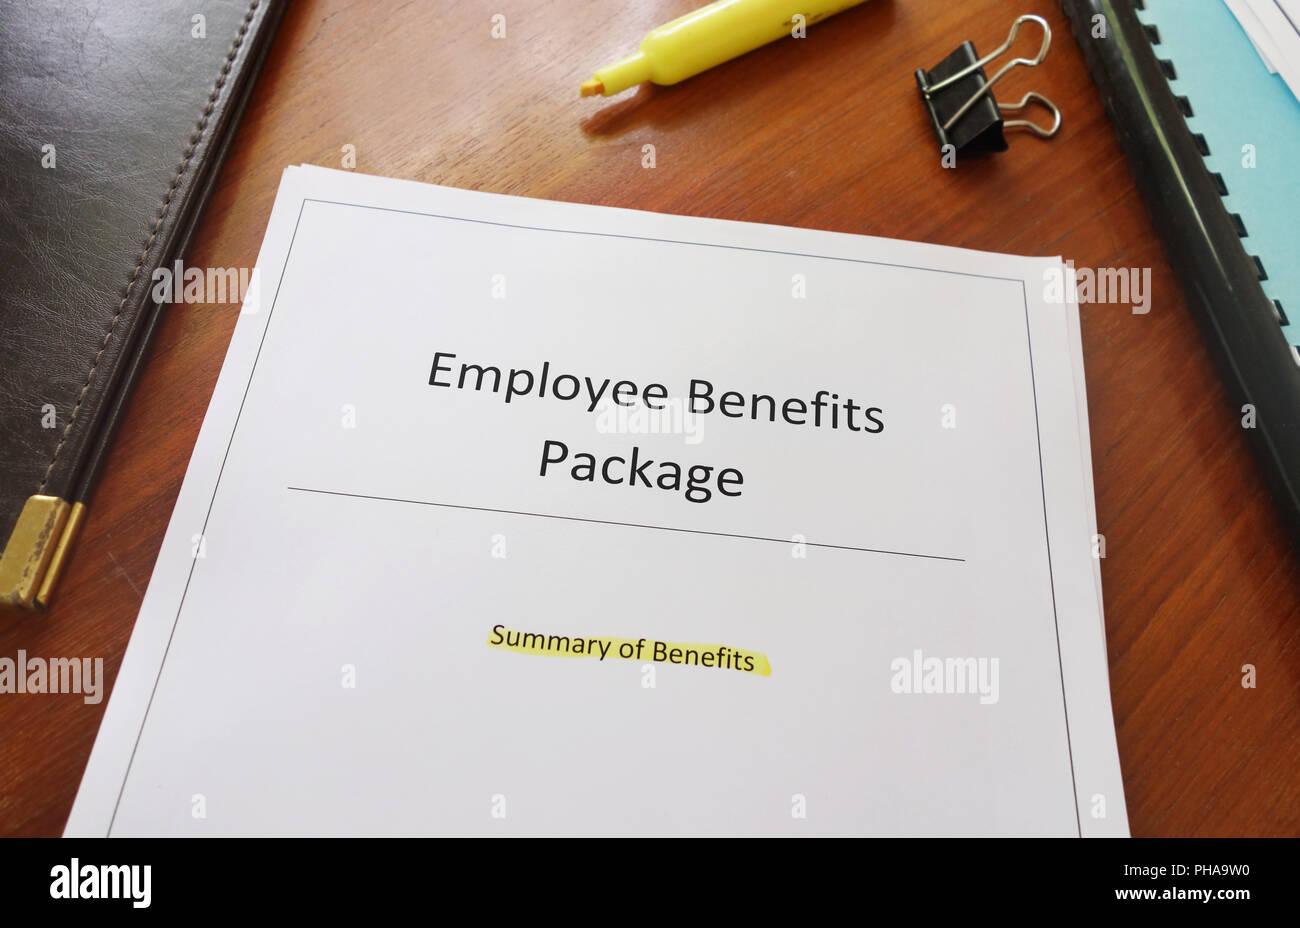 Employee Benefits Package - Stock Image